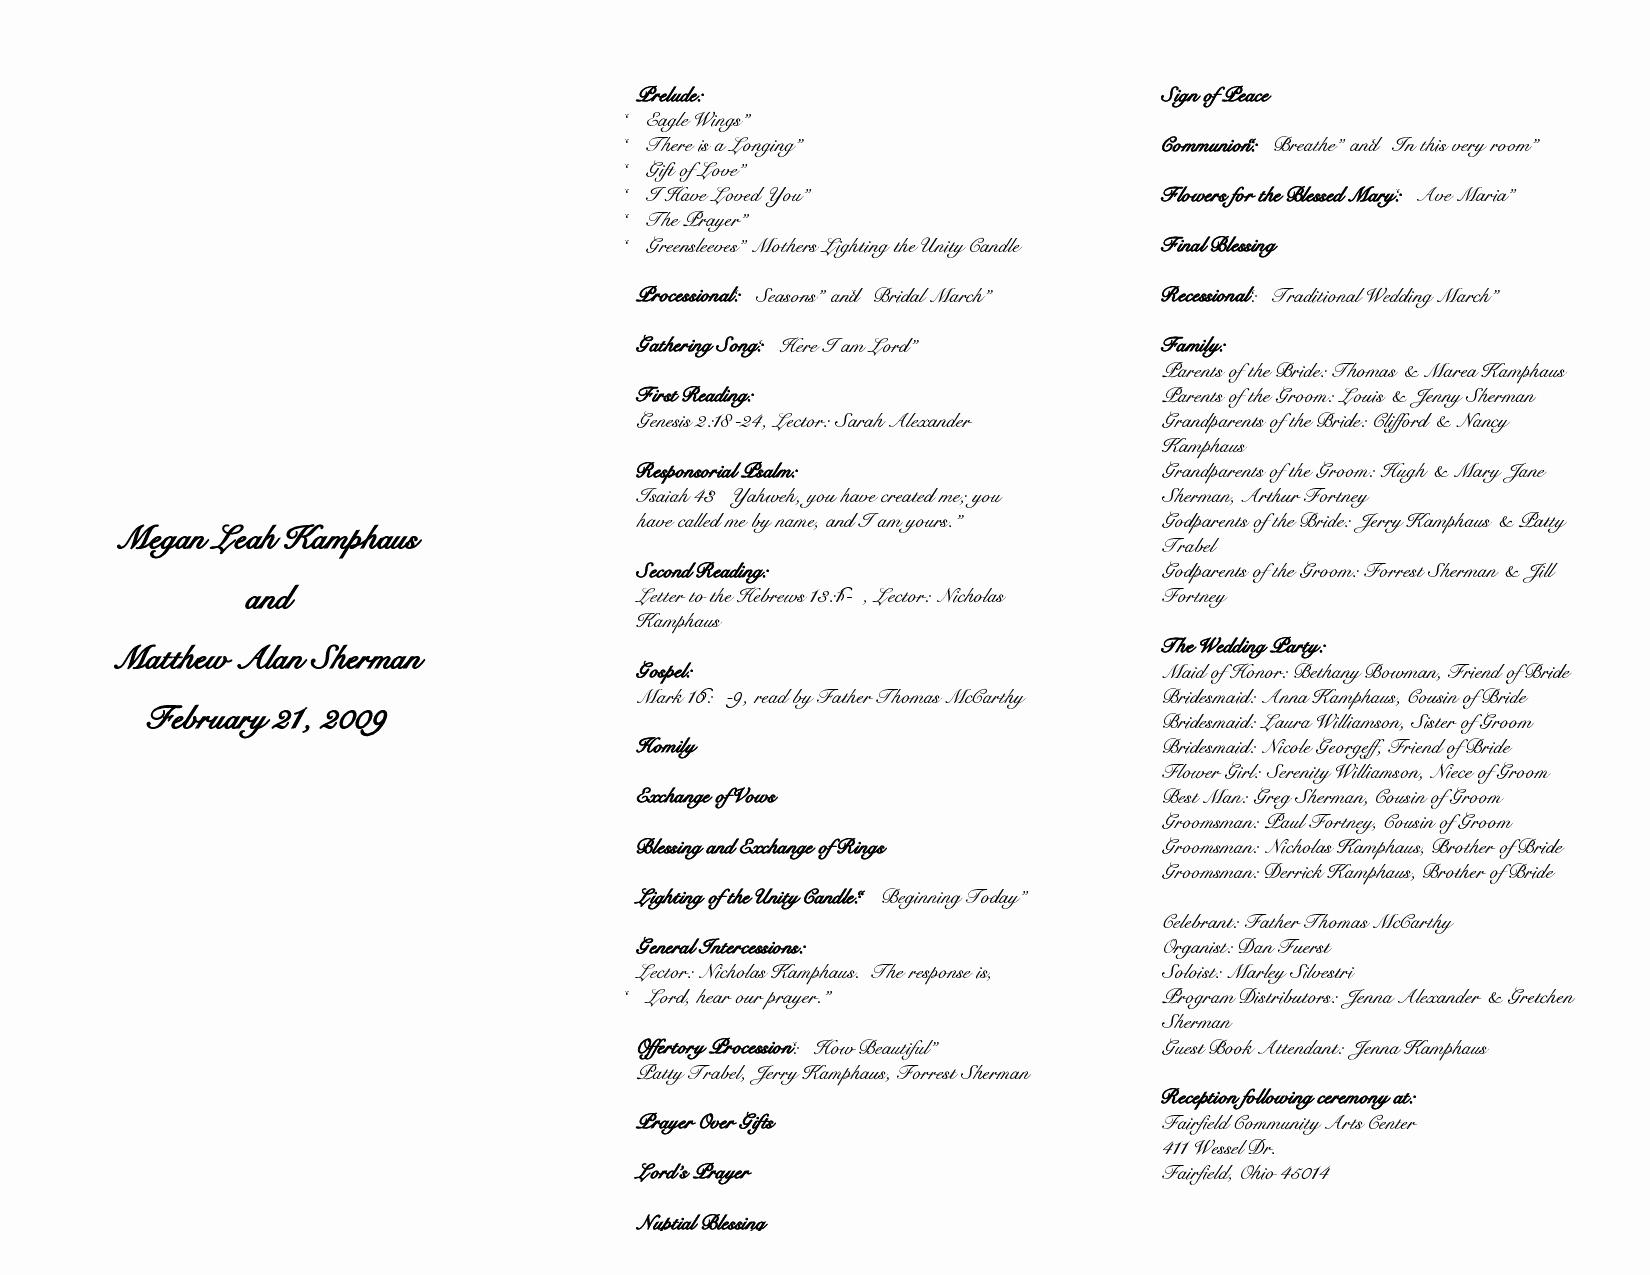 Funeral Mass Program Template Lovely 27 Of Catholic Funeral Mass Program Template